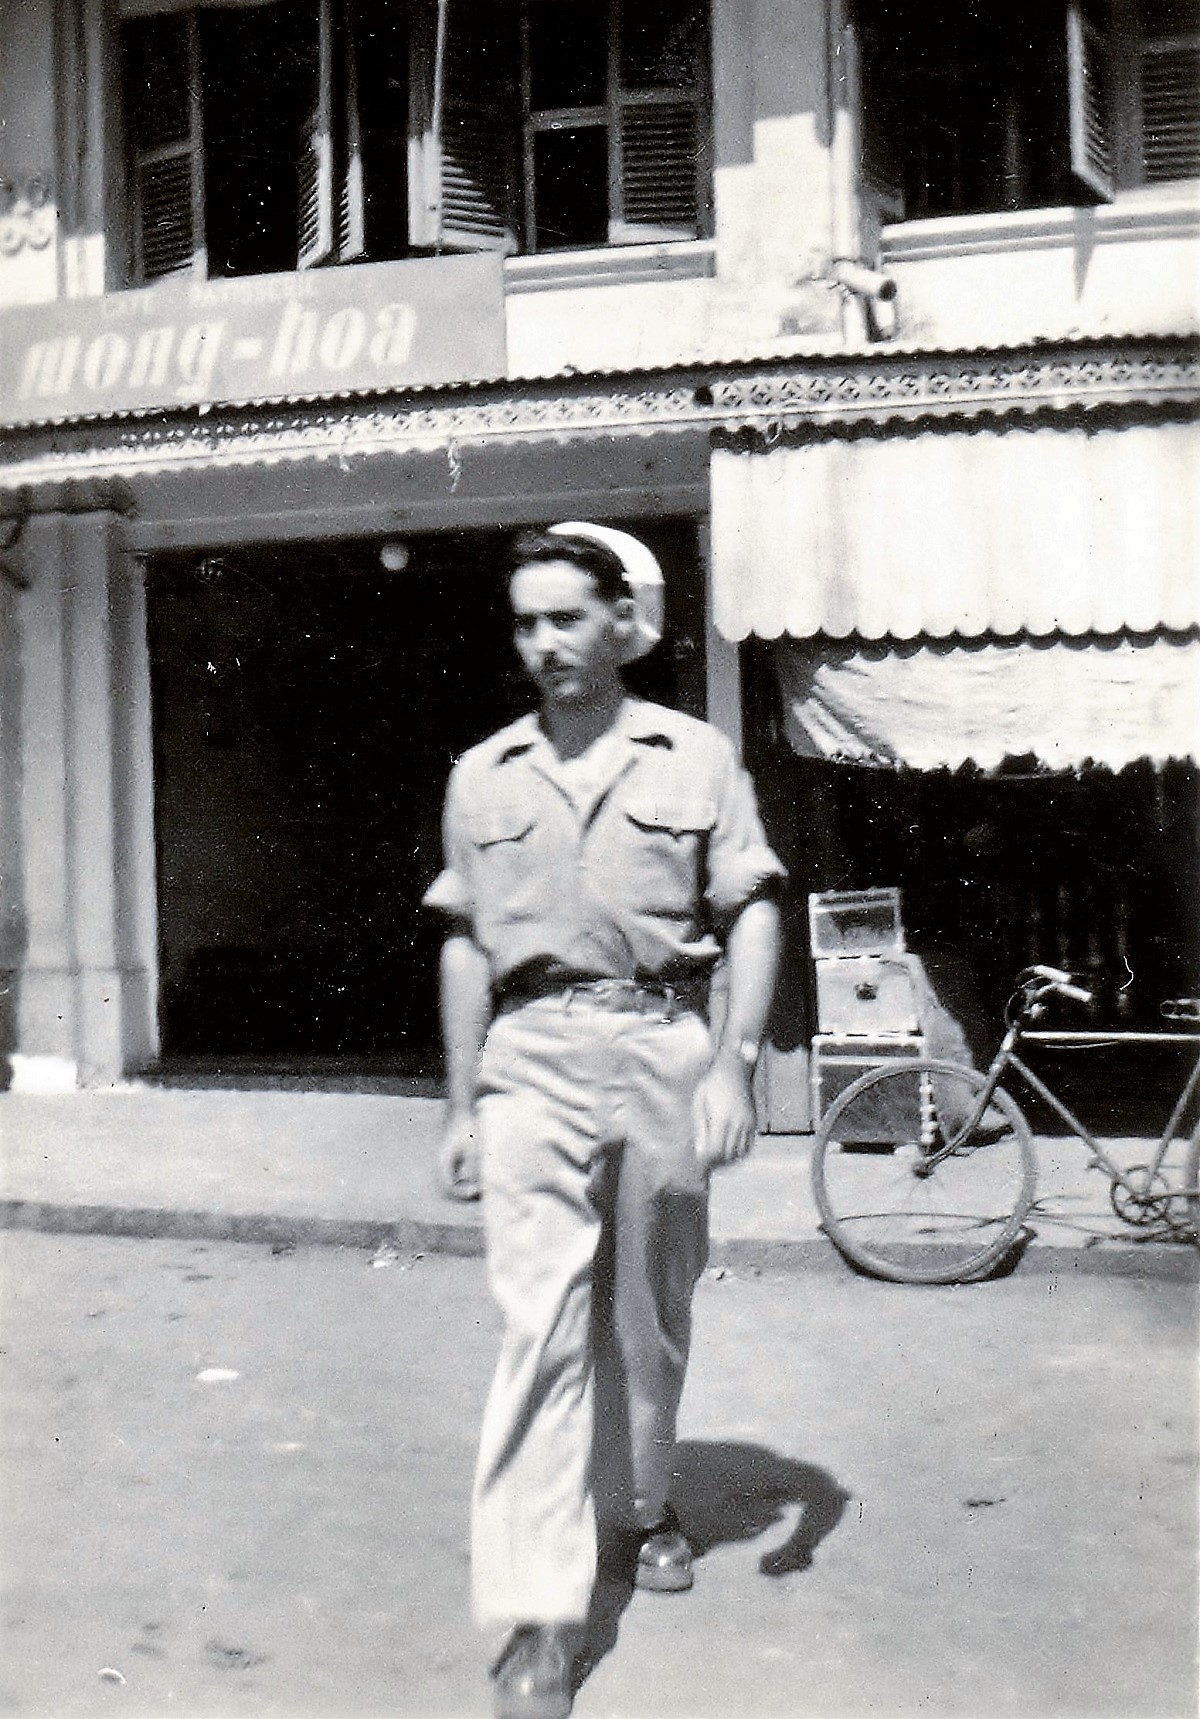 [Opérations de guerre] INDOCHINE - TOME 11 - Page 7 D_v_en11